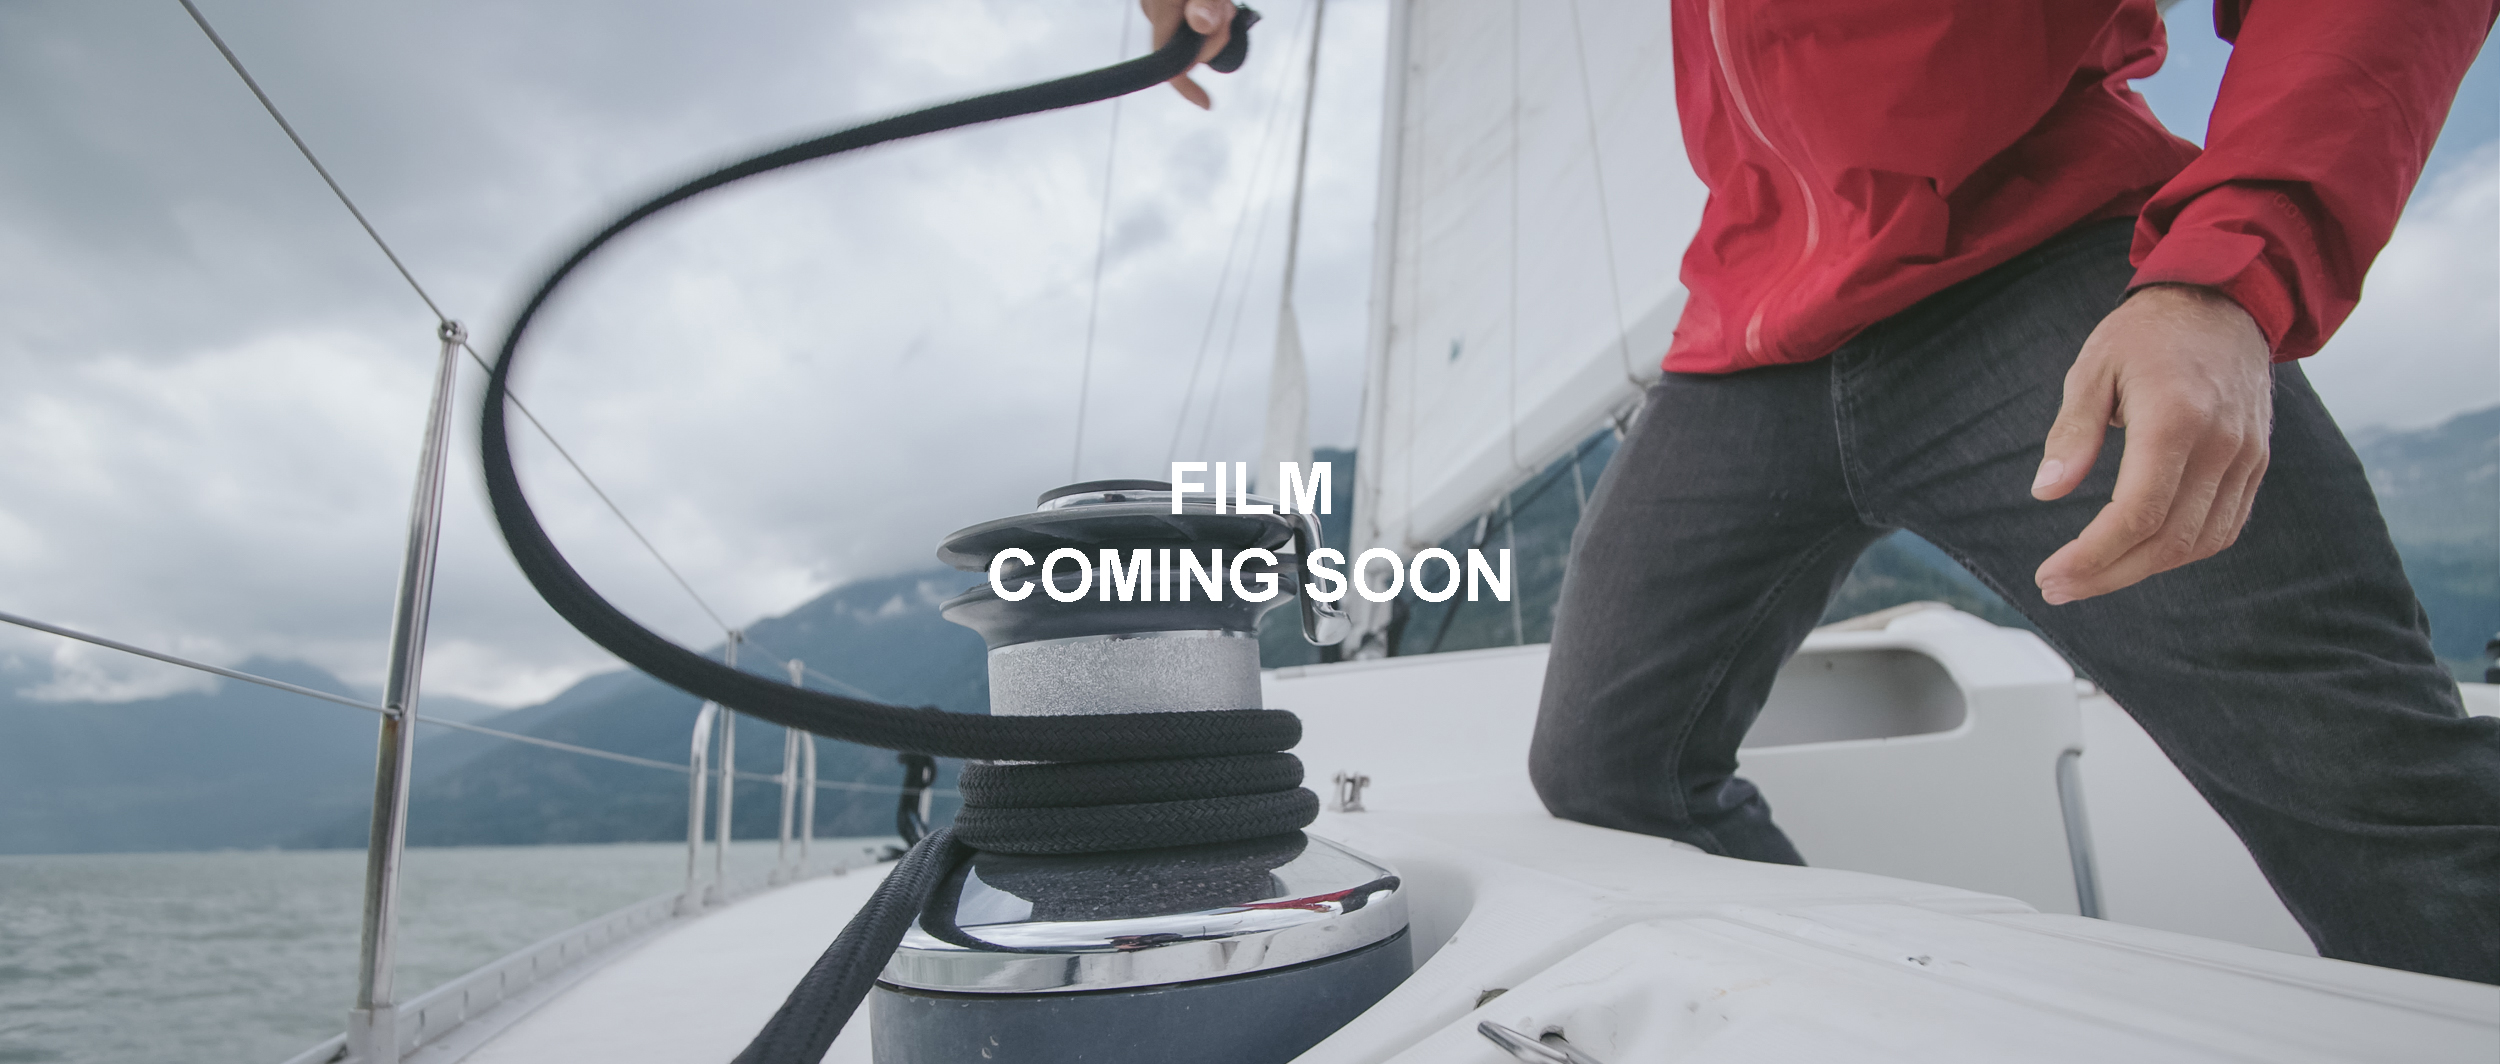 Sailing- coming soon.jpg